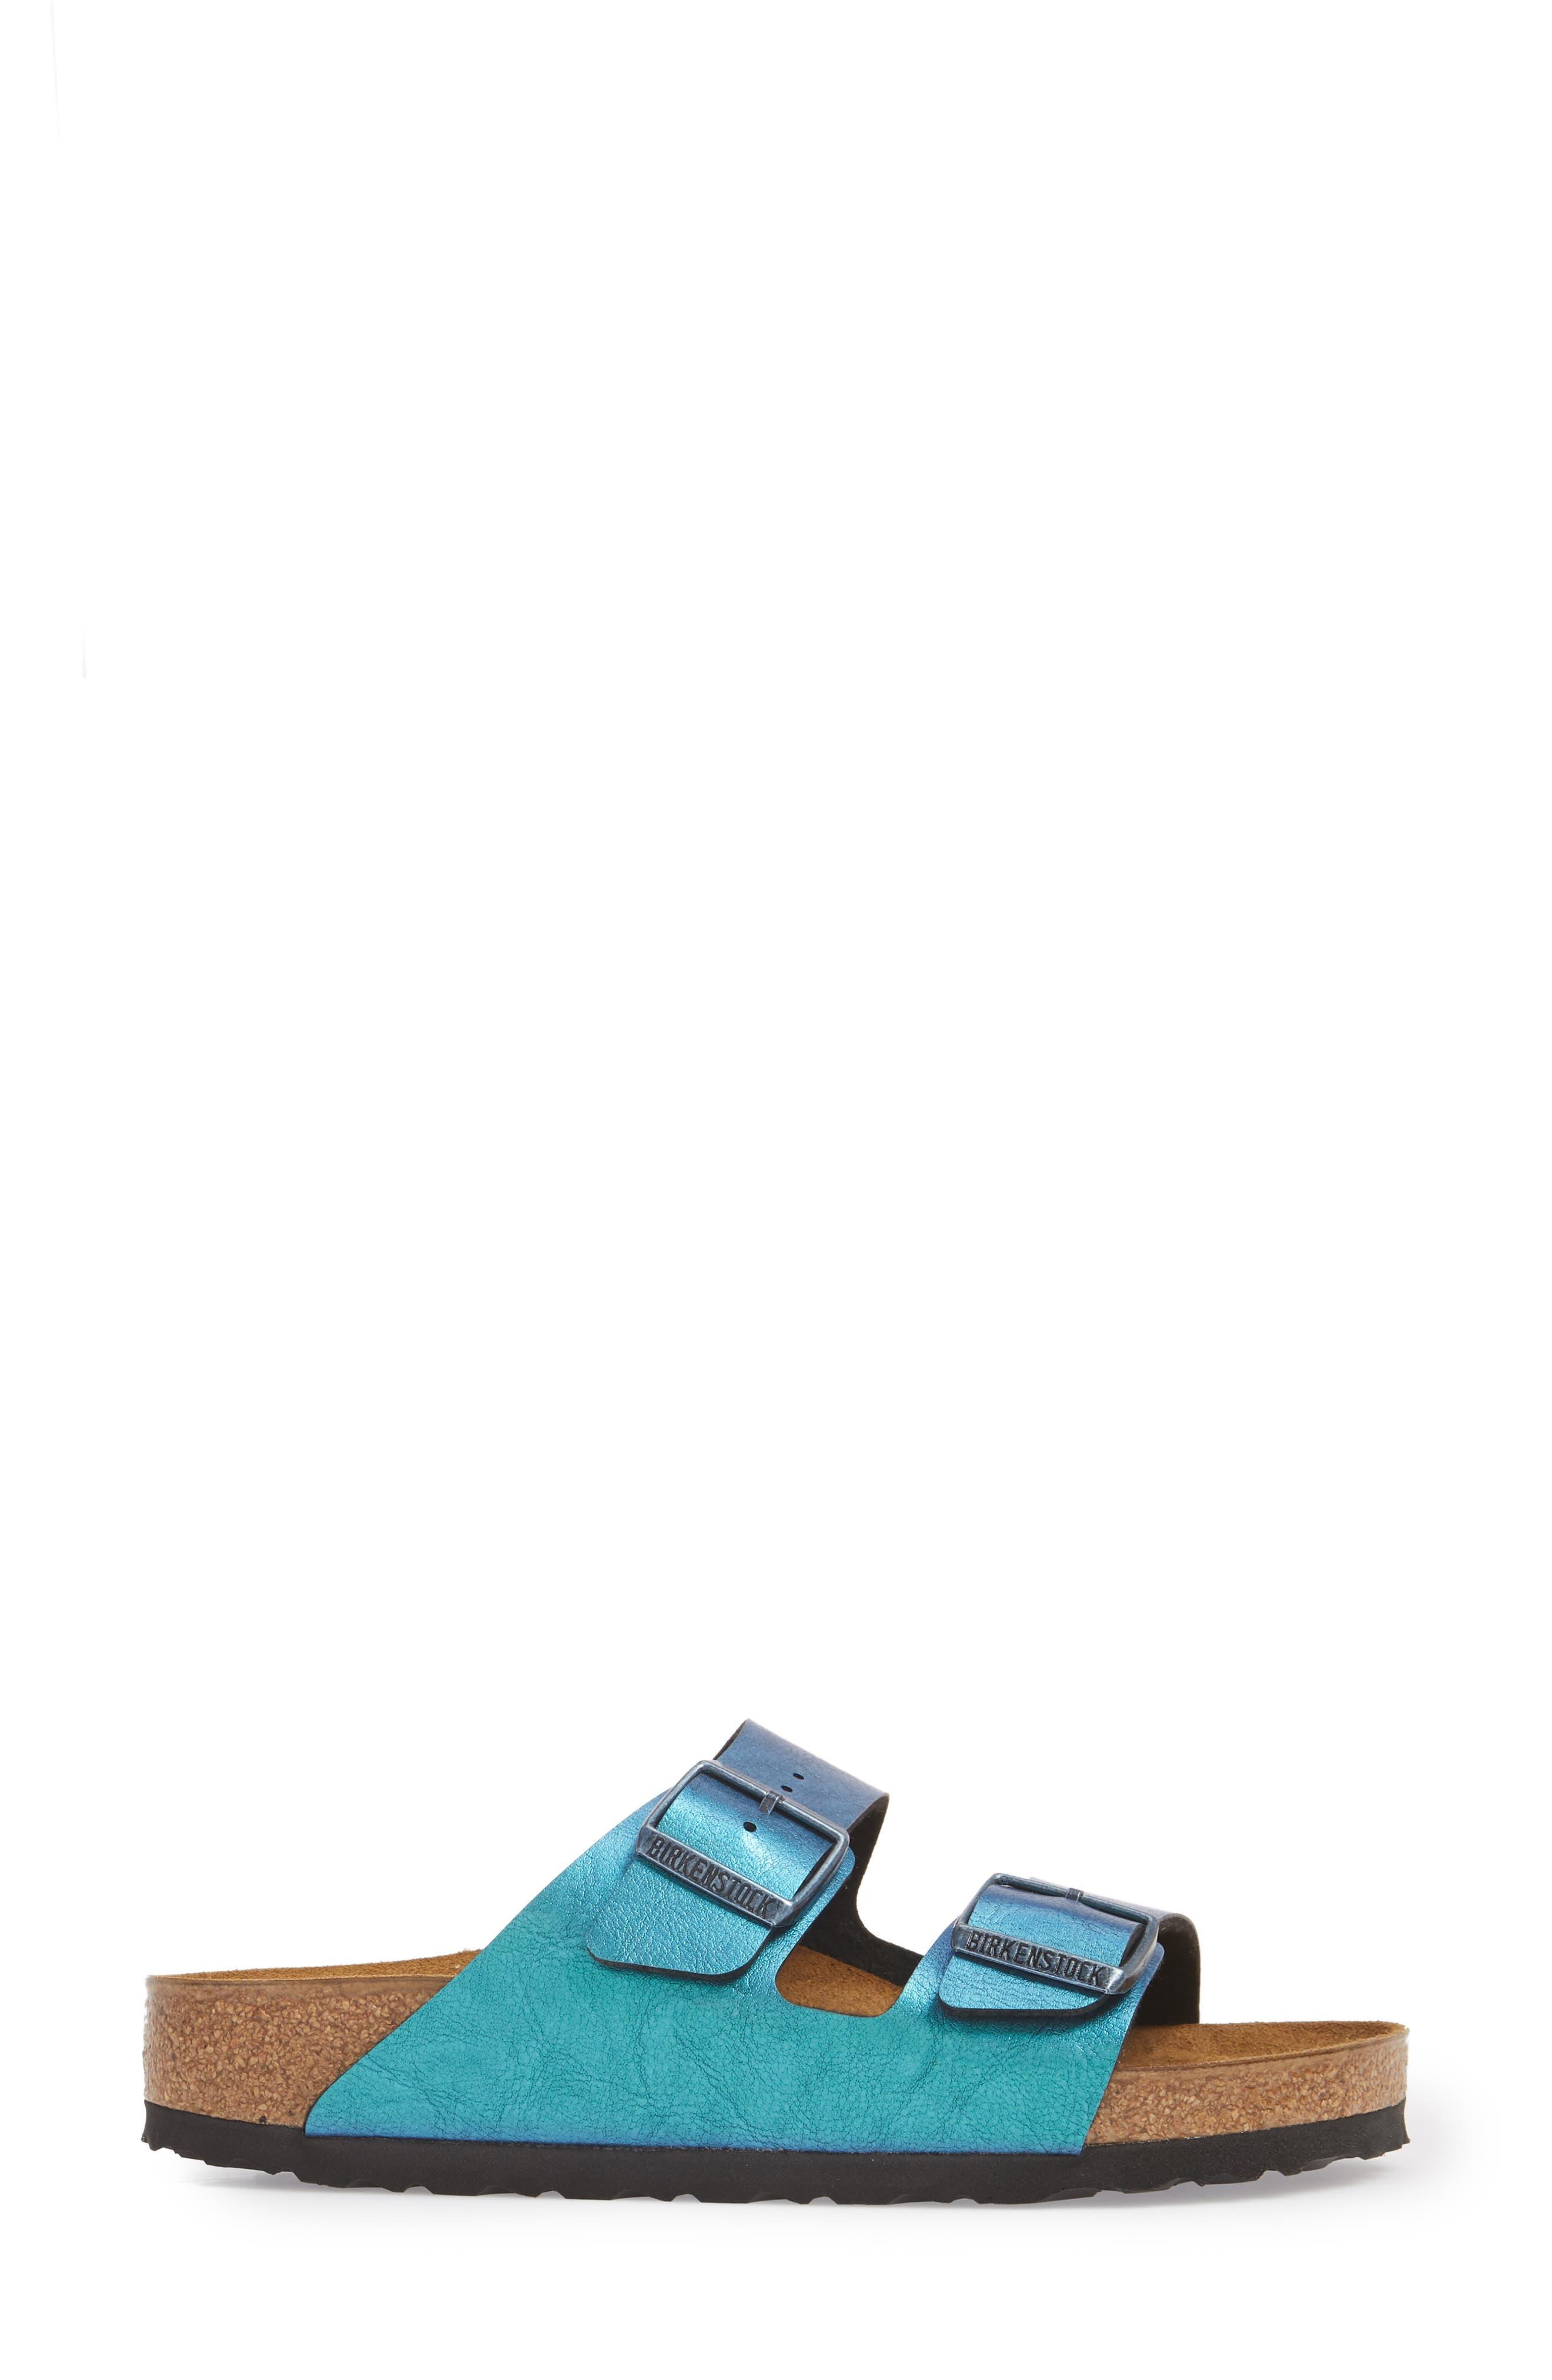 Arizona Graceful Birko-Flor<sup>™</sup> Sandal,                             Alternate thumbnail 3, color,                             Blue